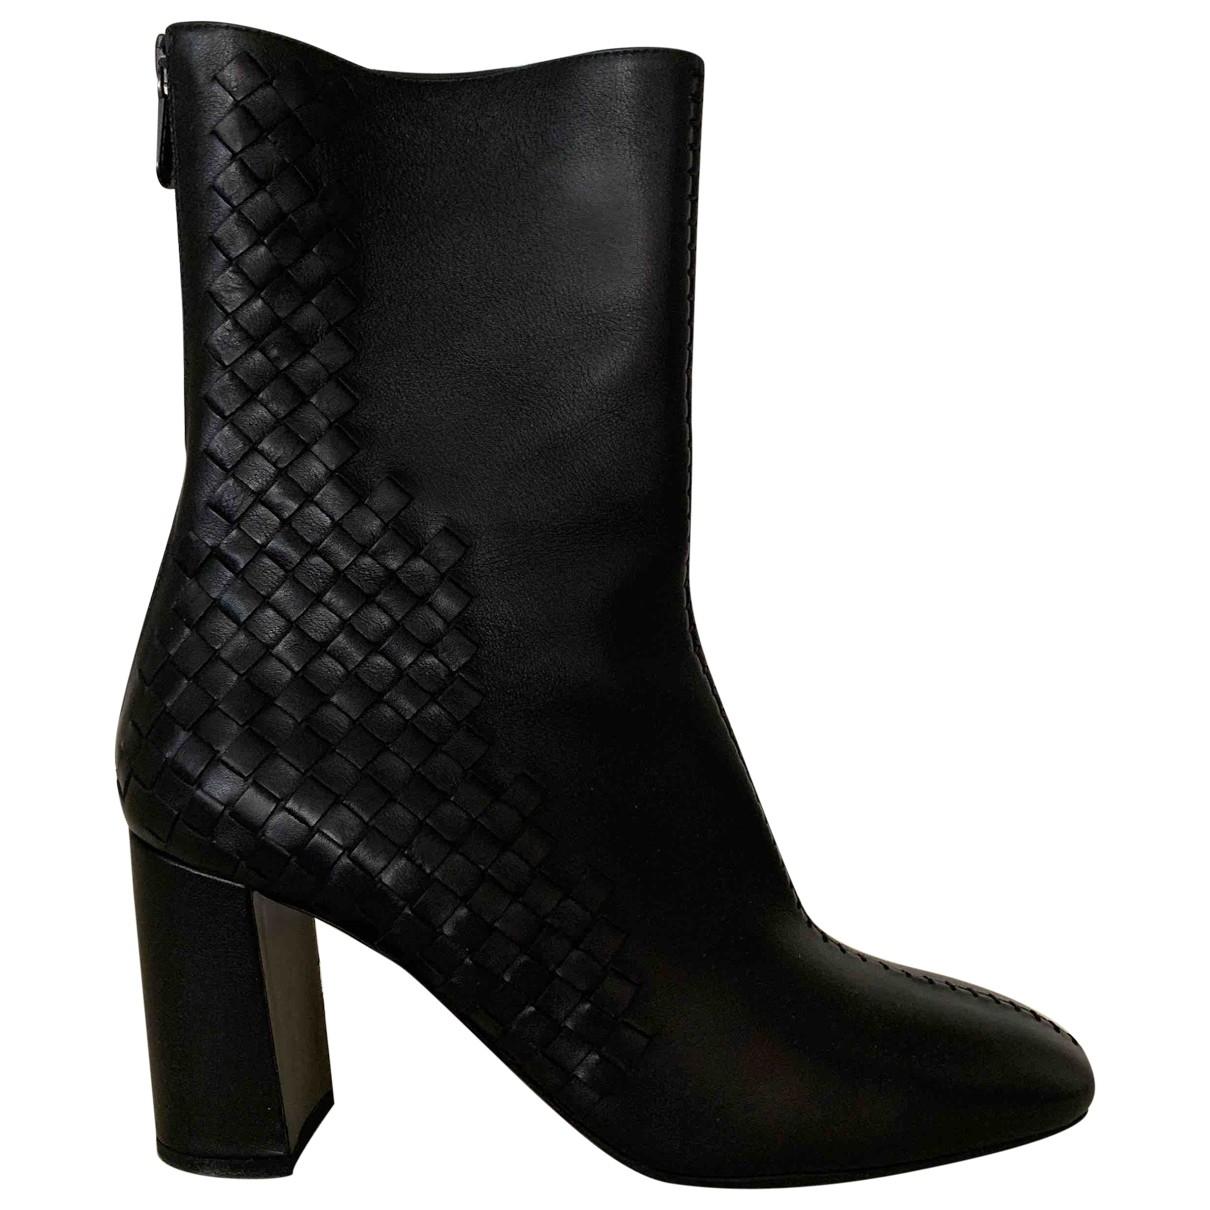 Bottega Veneta \N Black Leather Ankle boots for Women 40 EU